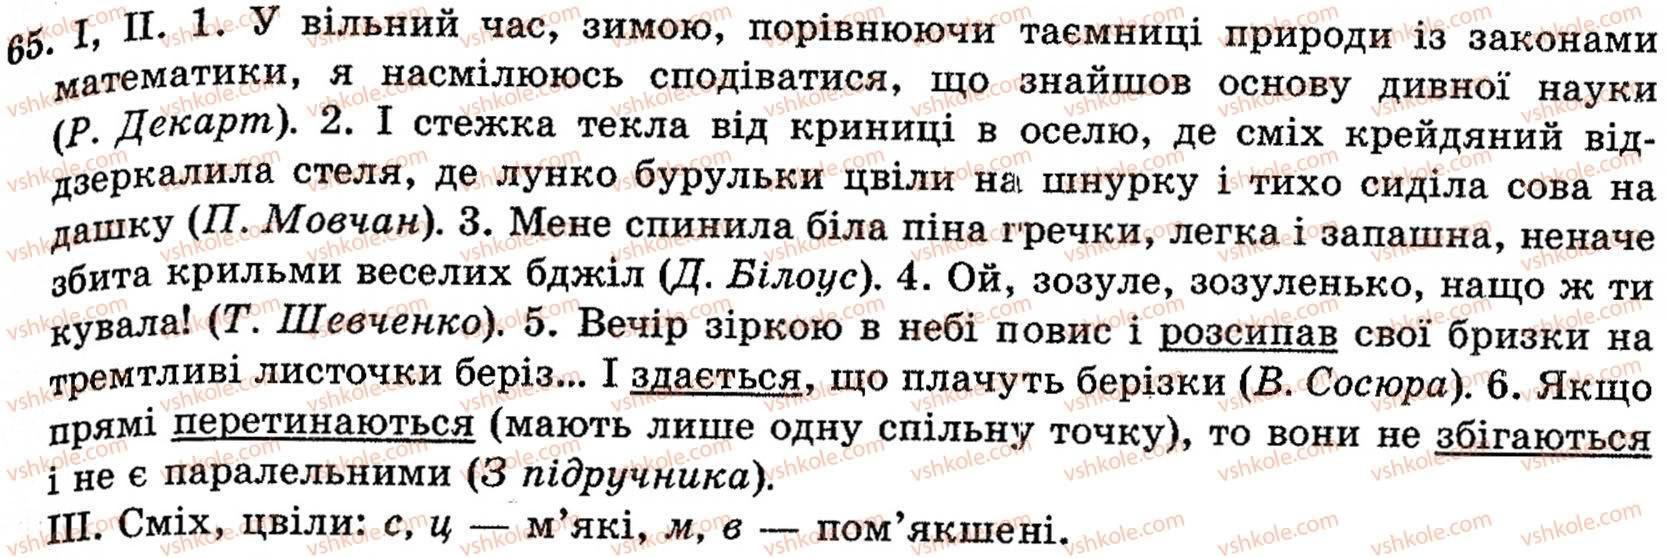 10-ukrayinska-mova-ov-zabolotnij-vv-zabolotnij-65